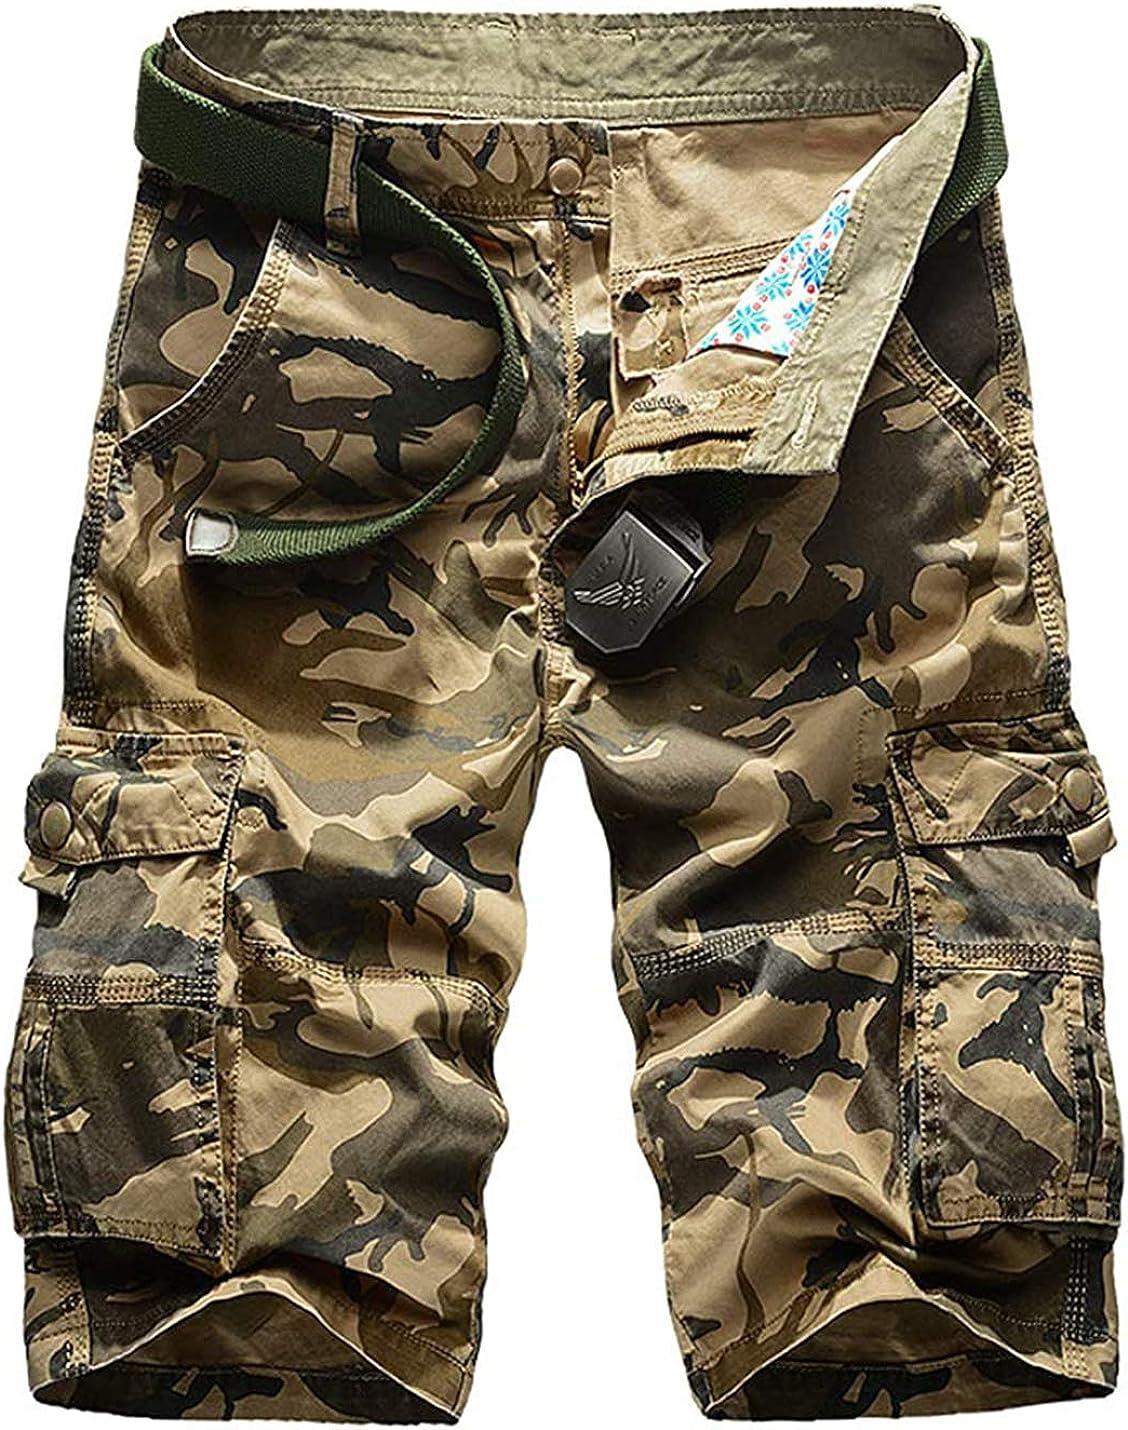 PAODIKUAI Men's Casual Loose Fit Multi-Pockets Camouflage Print Cargo Shorts Summer